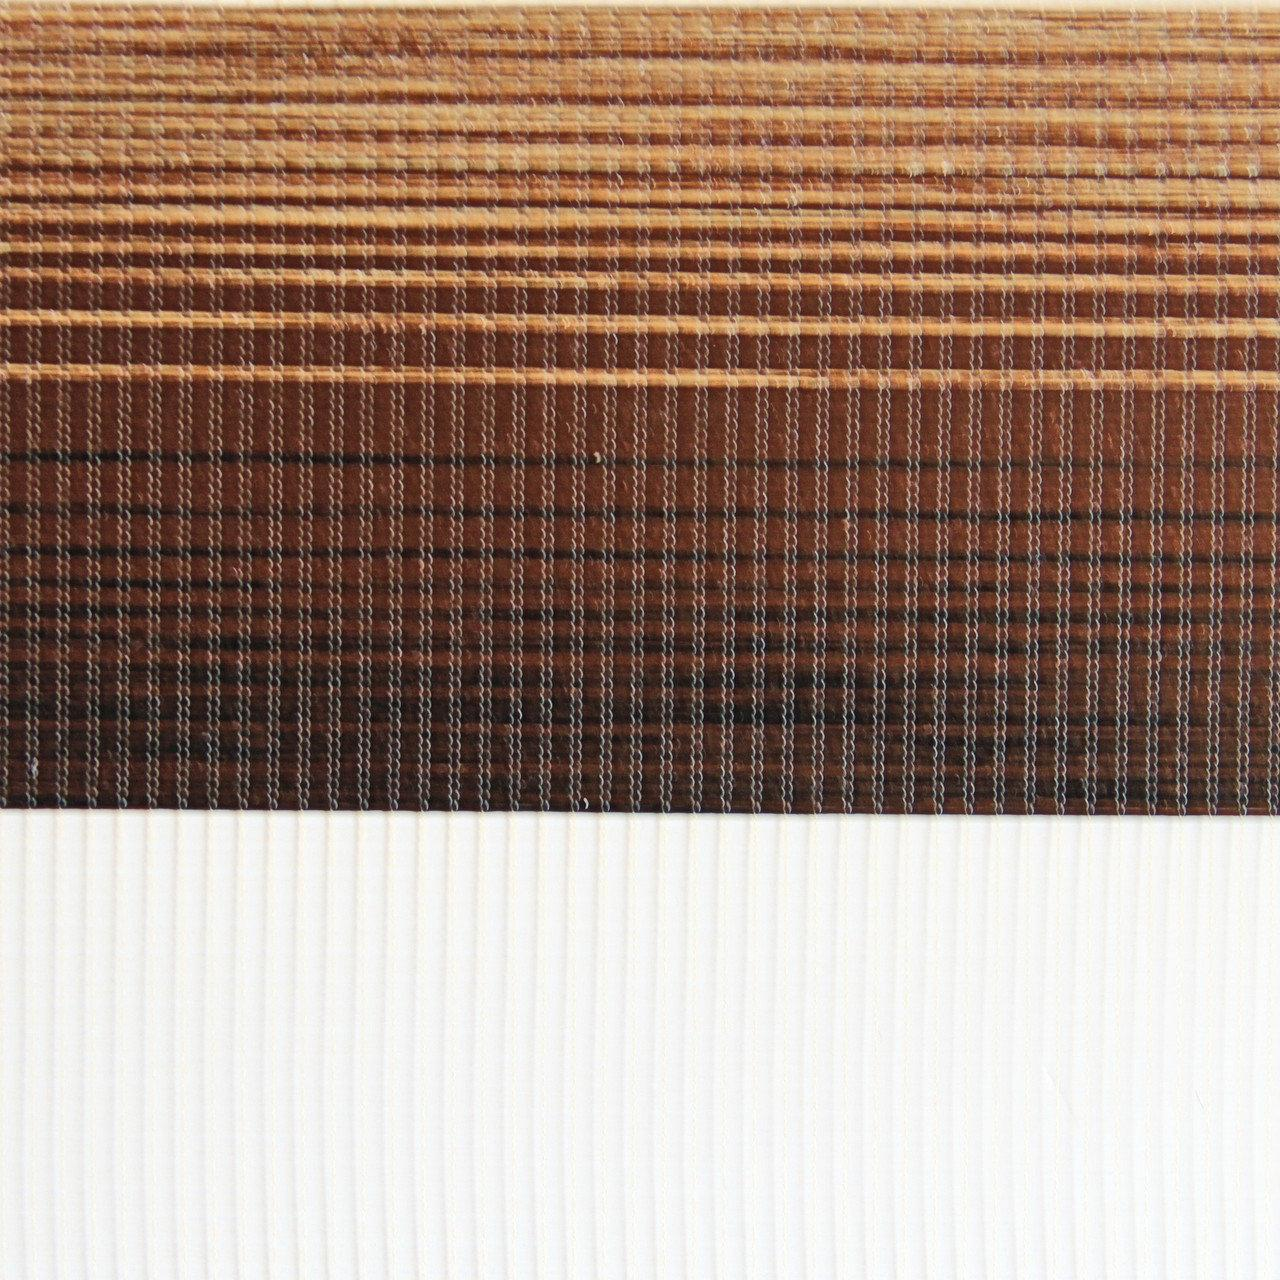 Готовые рулонные шторы Ткань Z-133 Венге